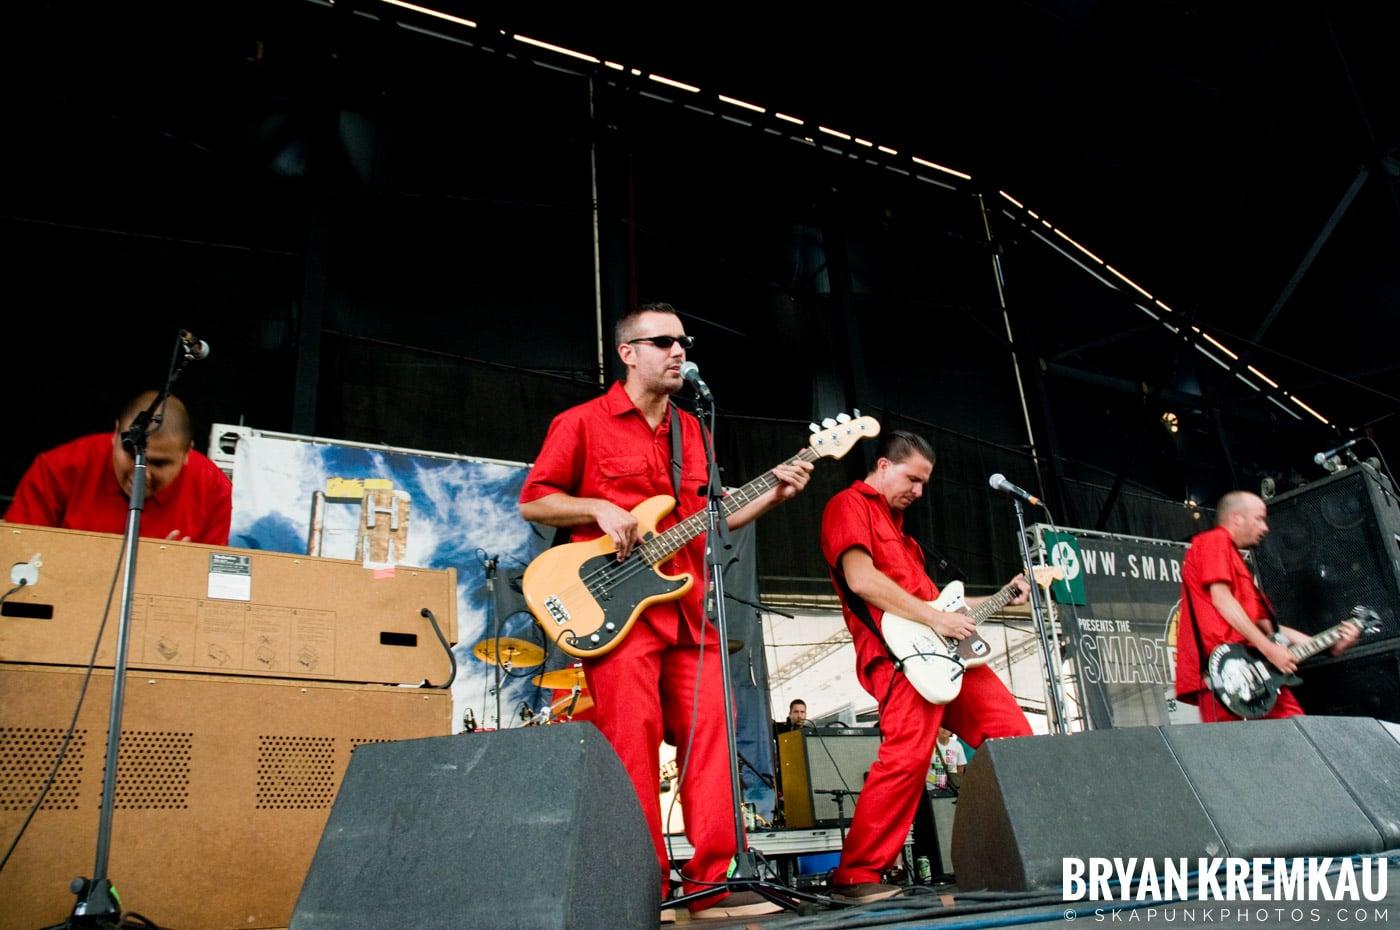 The Aggrolites @ Warped Tour 08, Scranton PA - 7.27.08 (11)